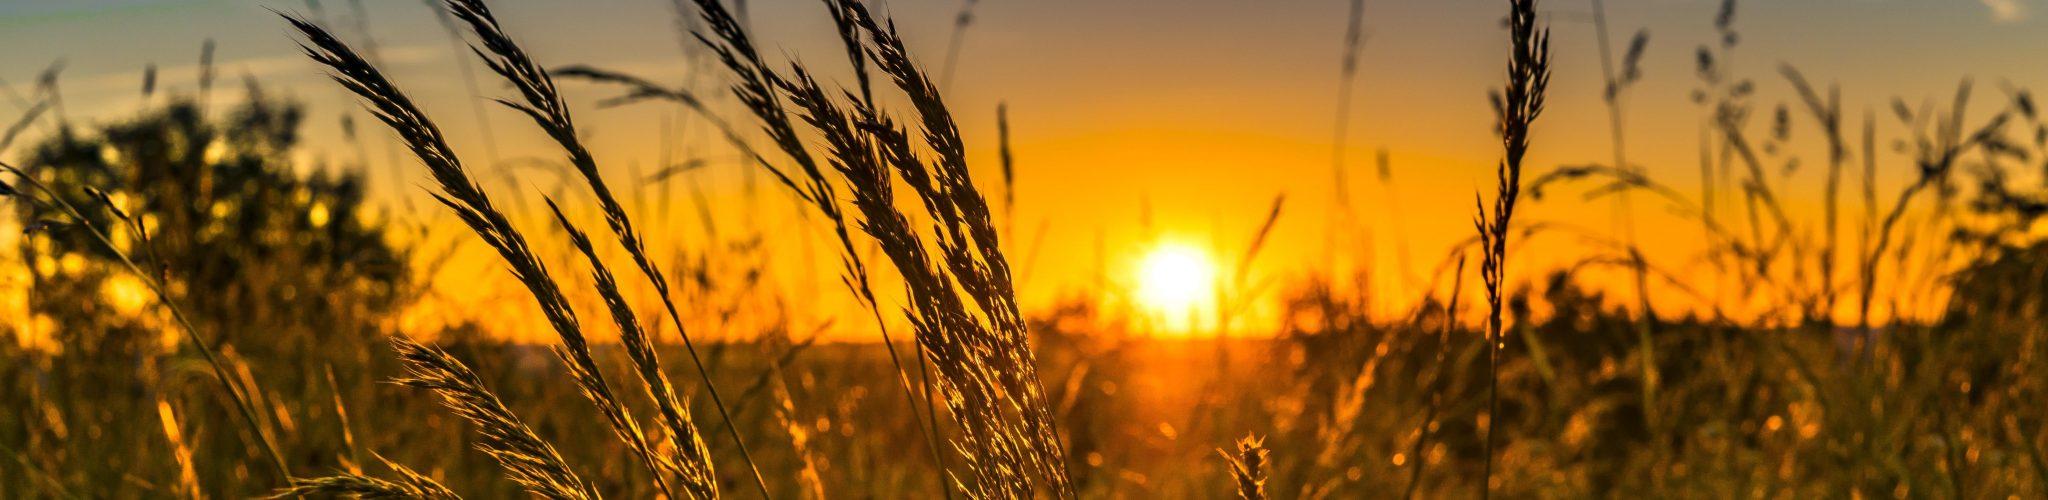 allergie intolleranze alimentari malattie respiratorie